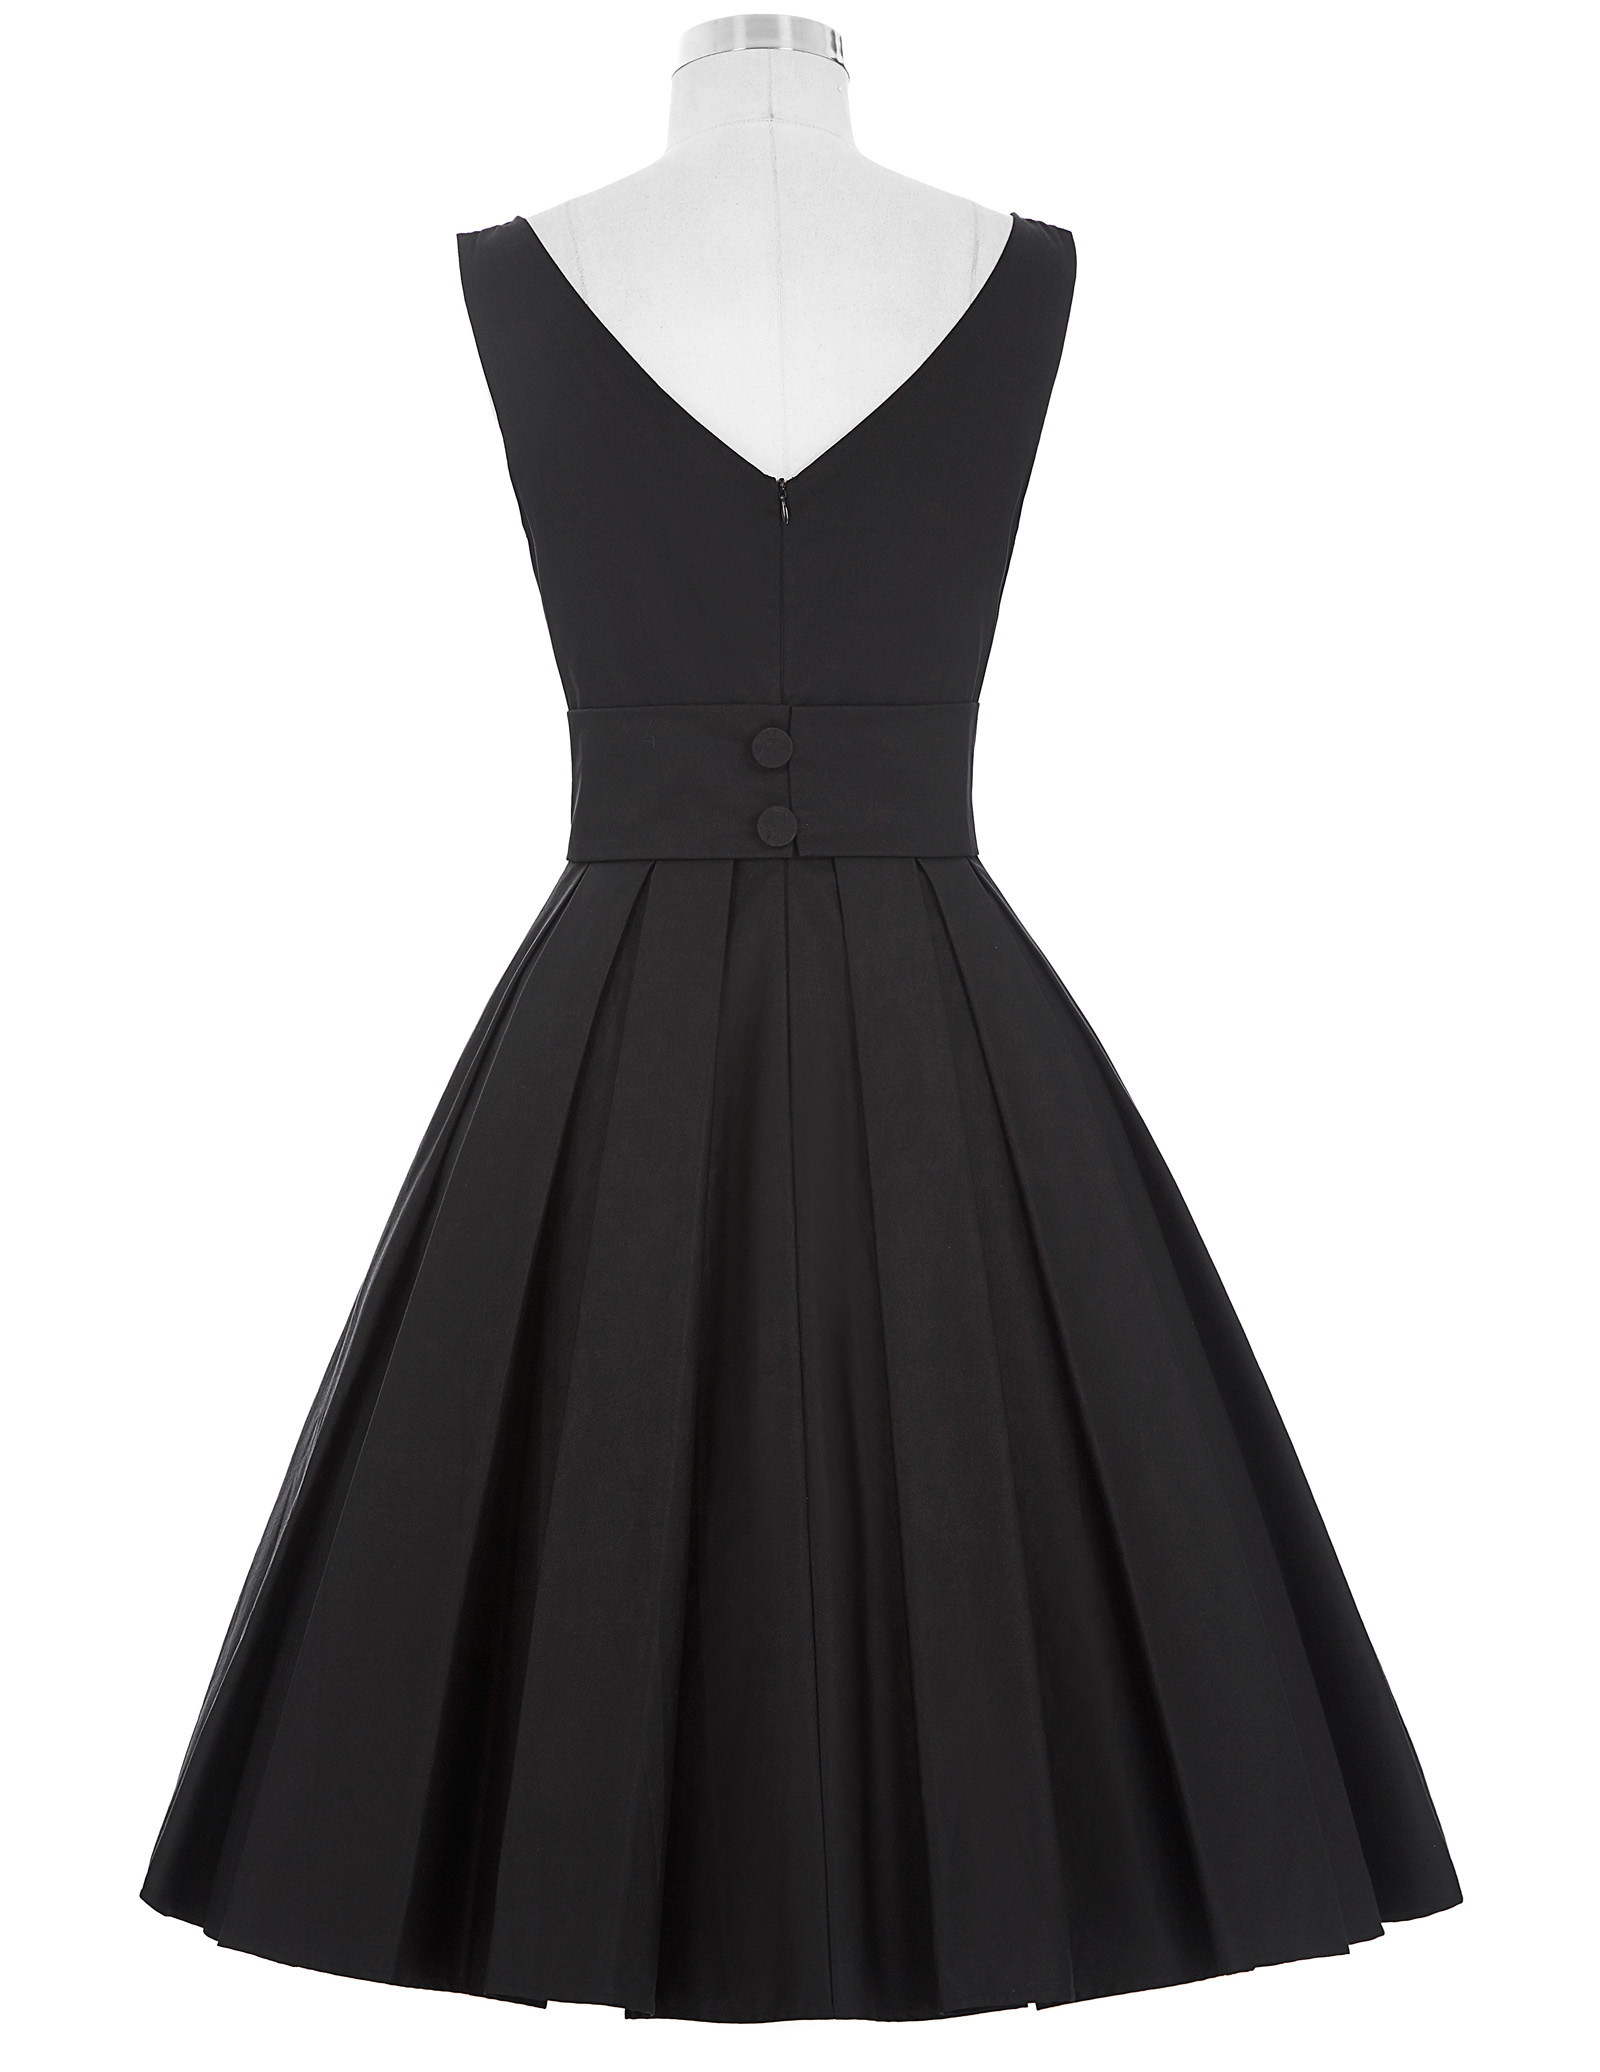 Vintage Dresses 50s 60s Retro Sleeveless Crew Neck V-Back Tunic Party Picnic Midi Dress vestidos